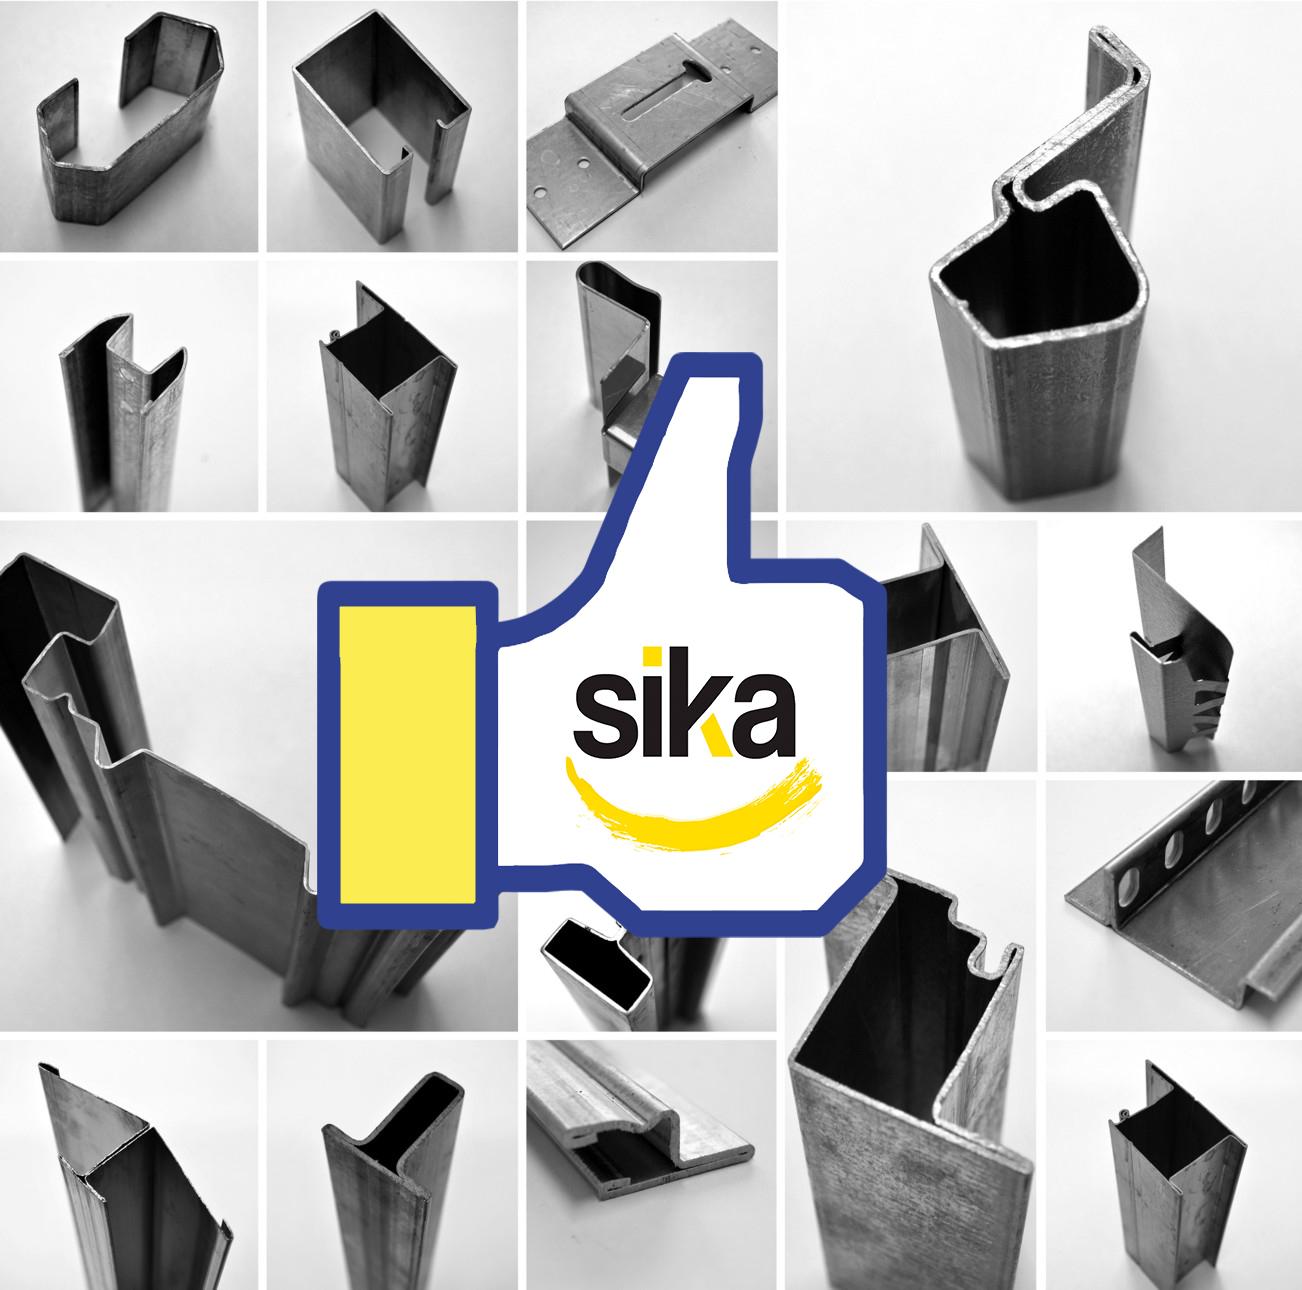 sika_profili_like